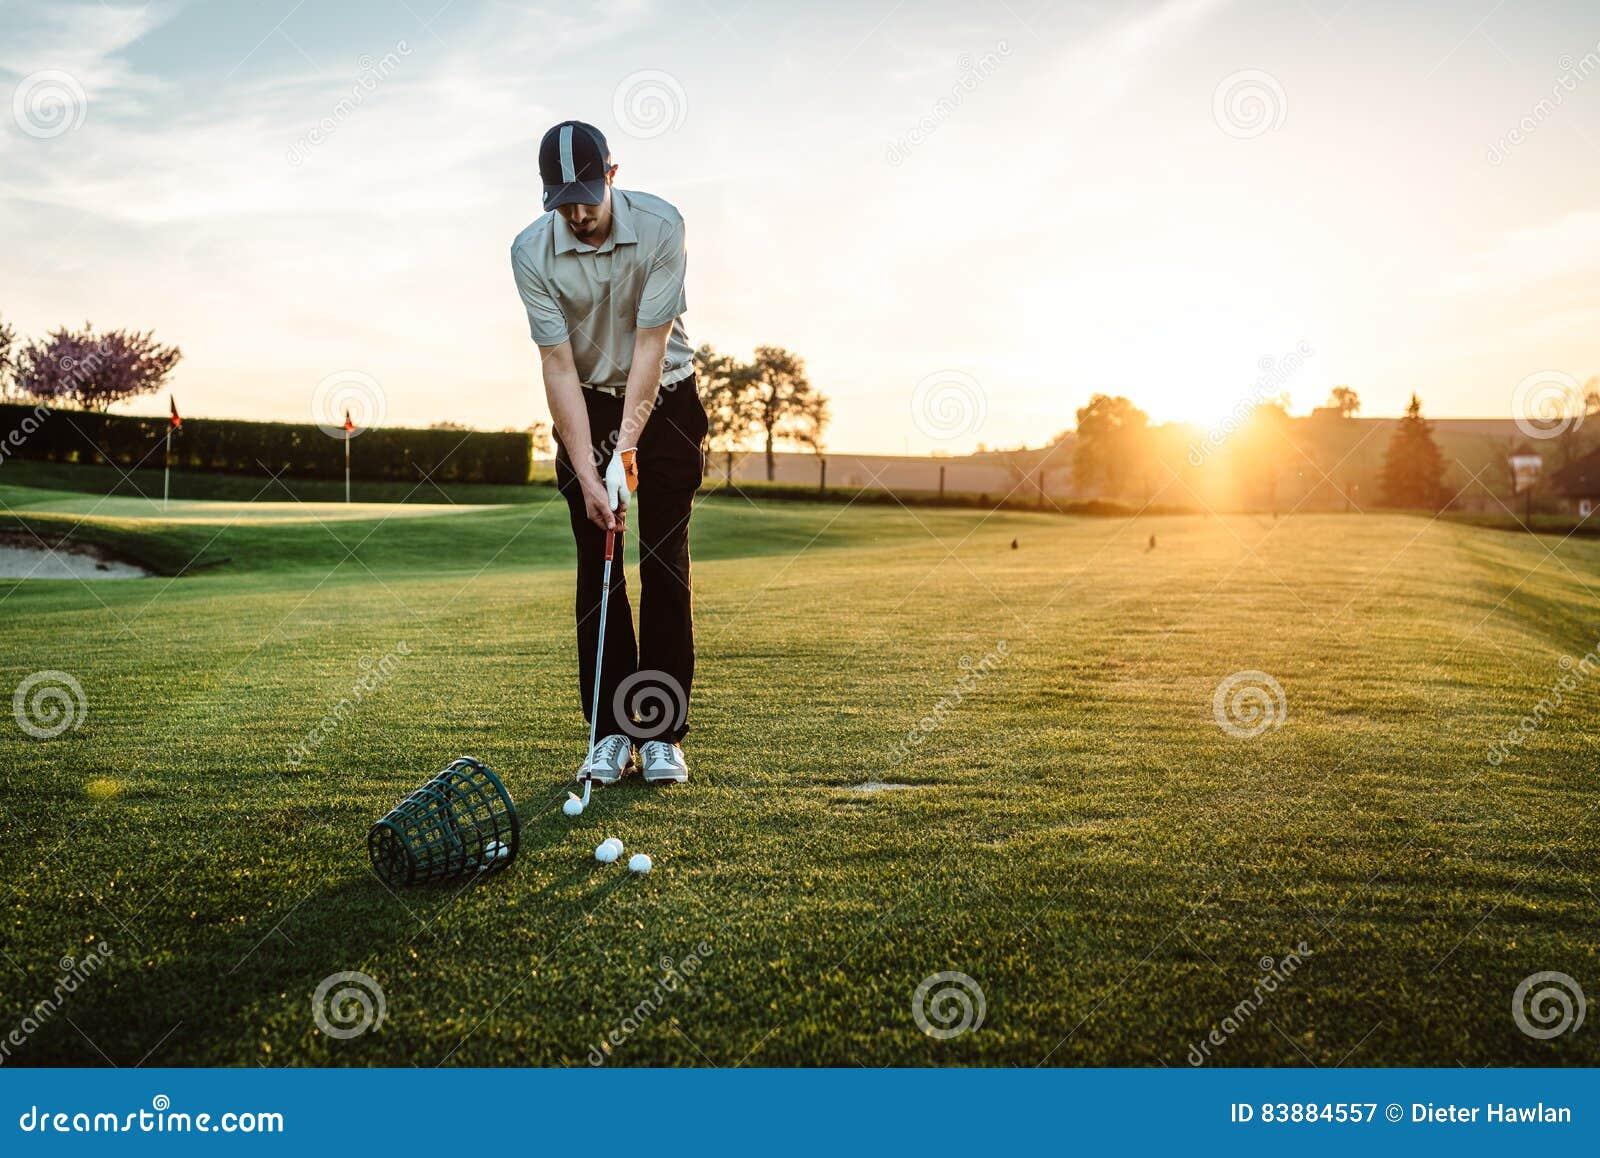 Download Young man playing golf stock image. Image of people, orange - 83884557